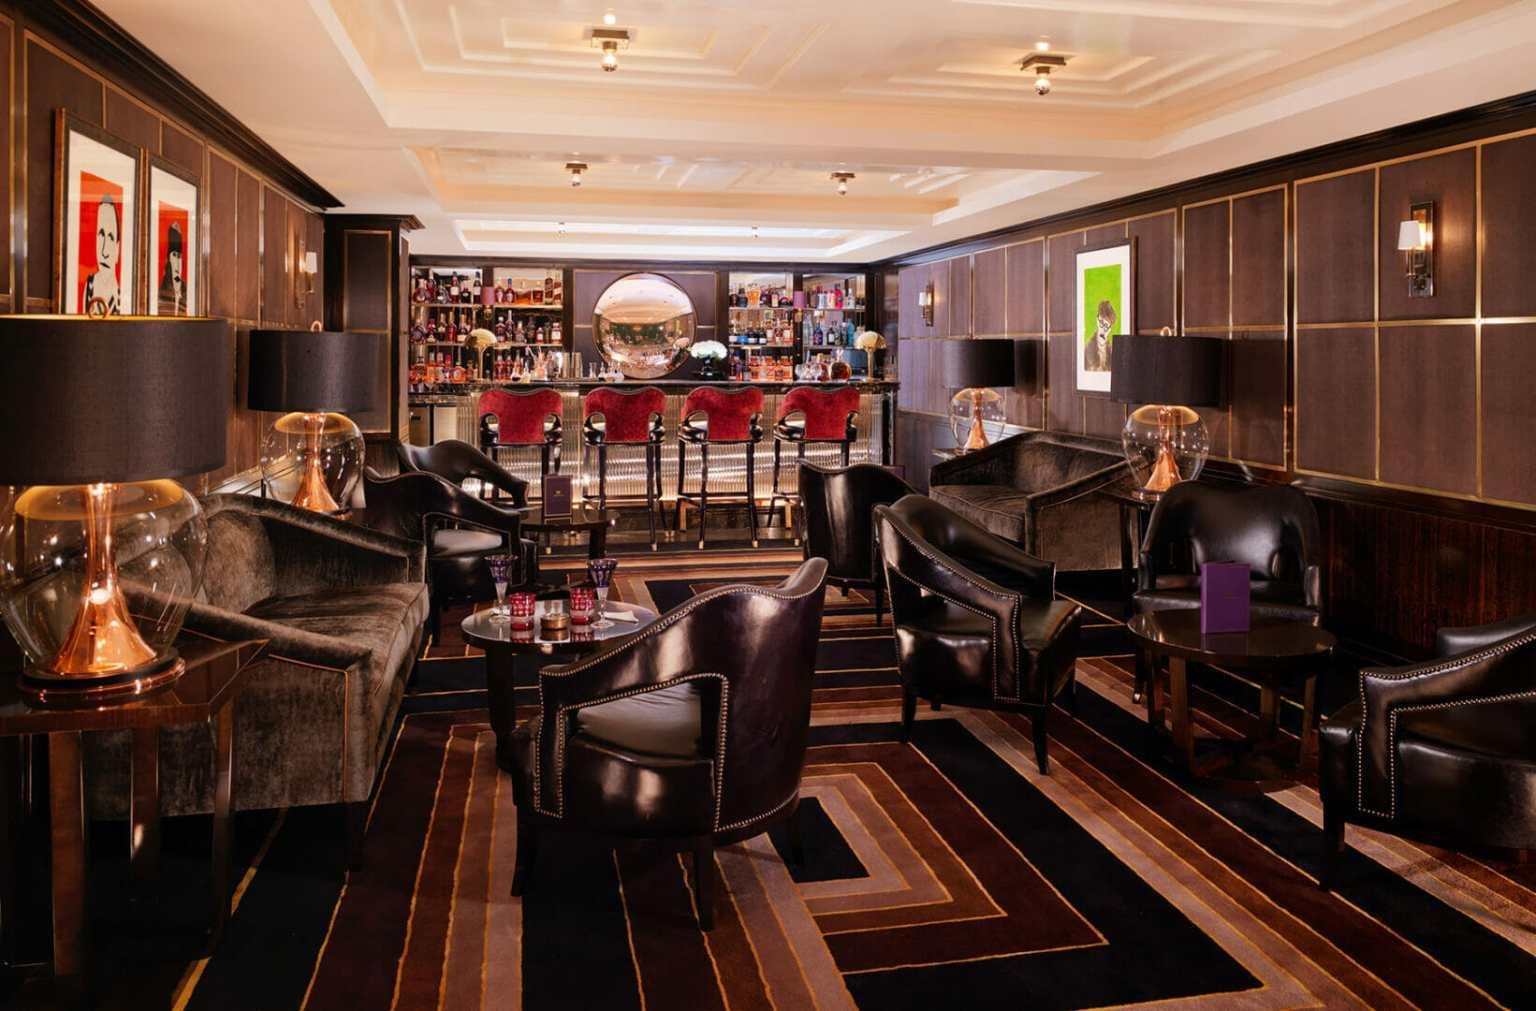 Flemings Mayfair named as Top Ten London Hotel - Hotelier